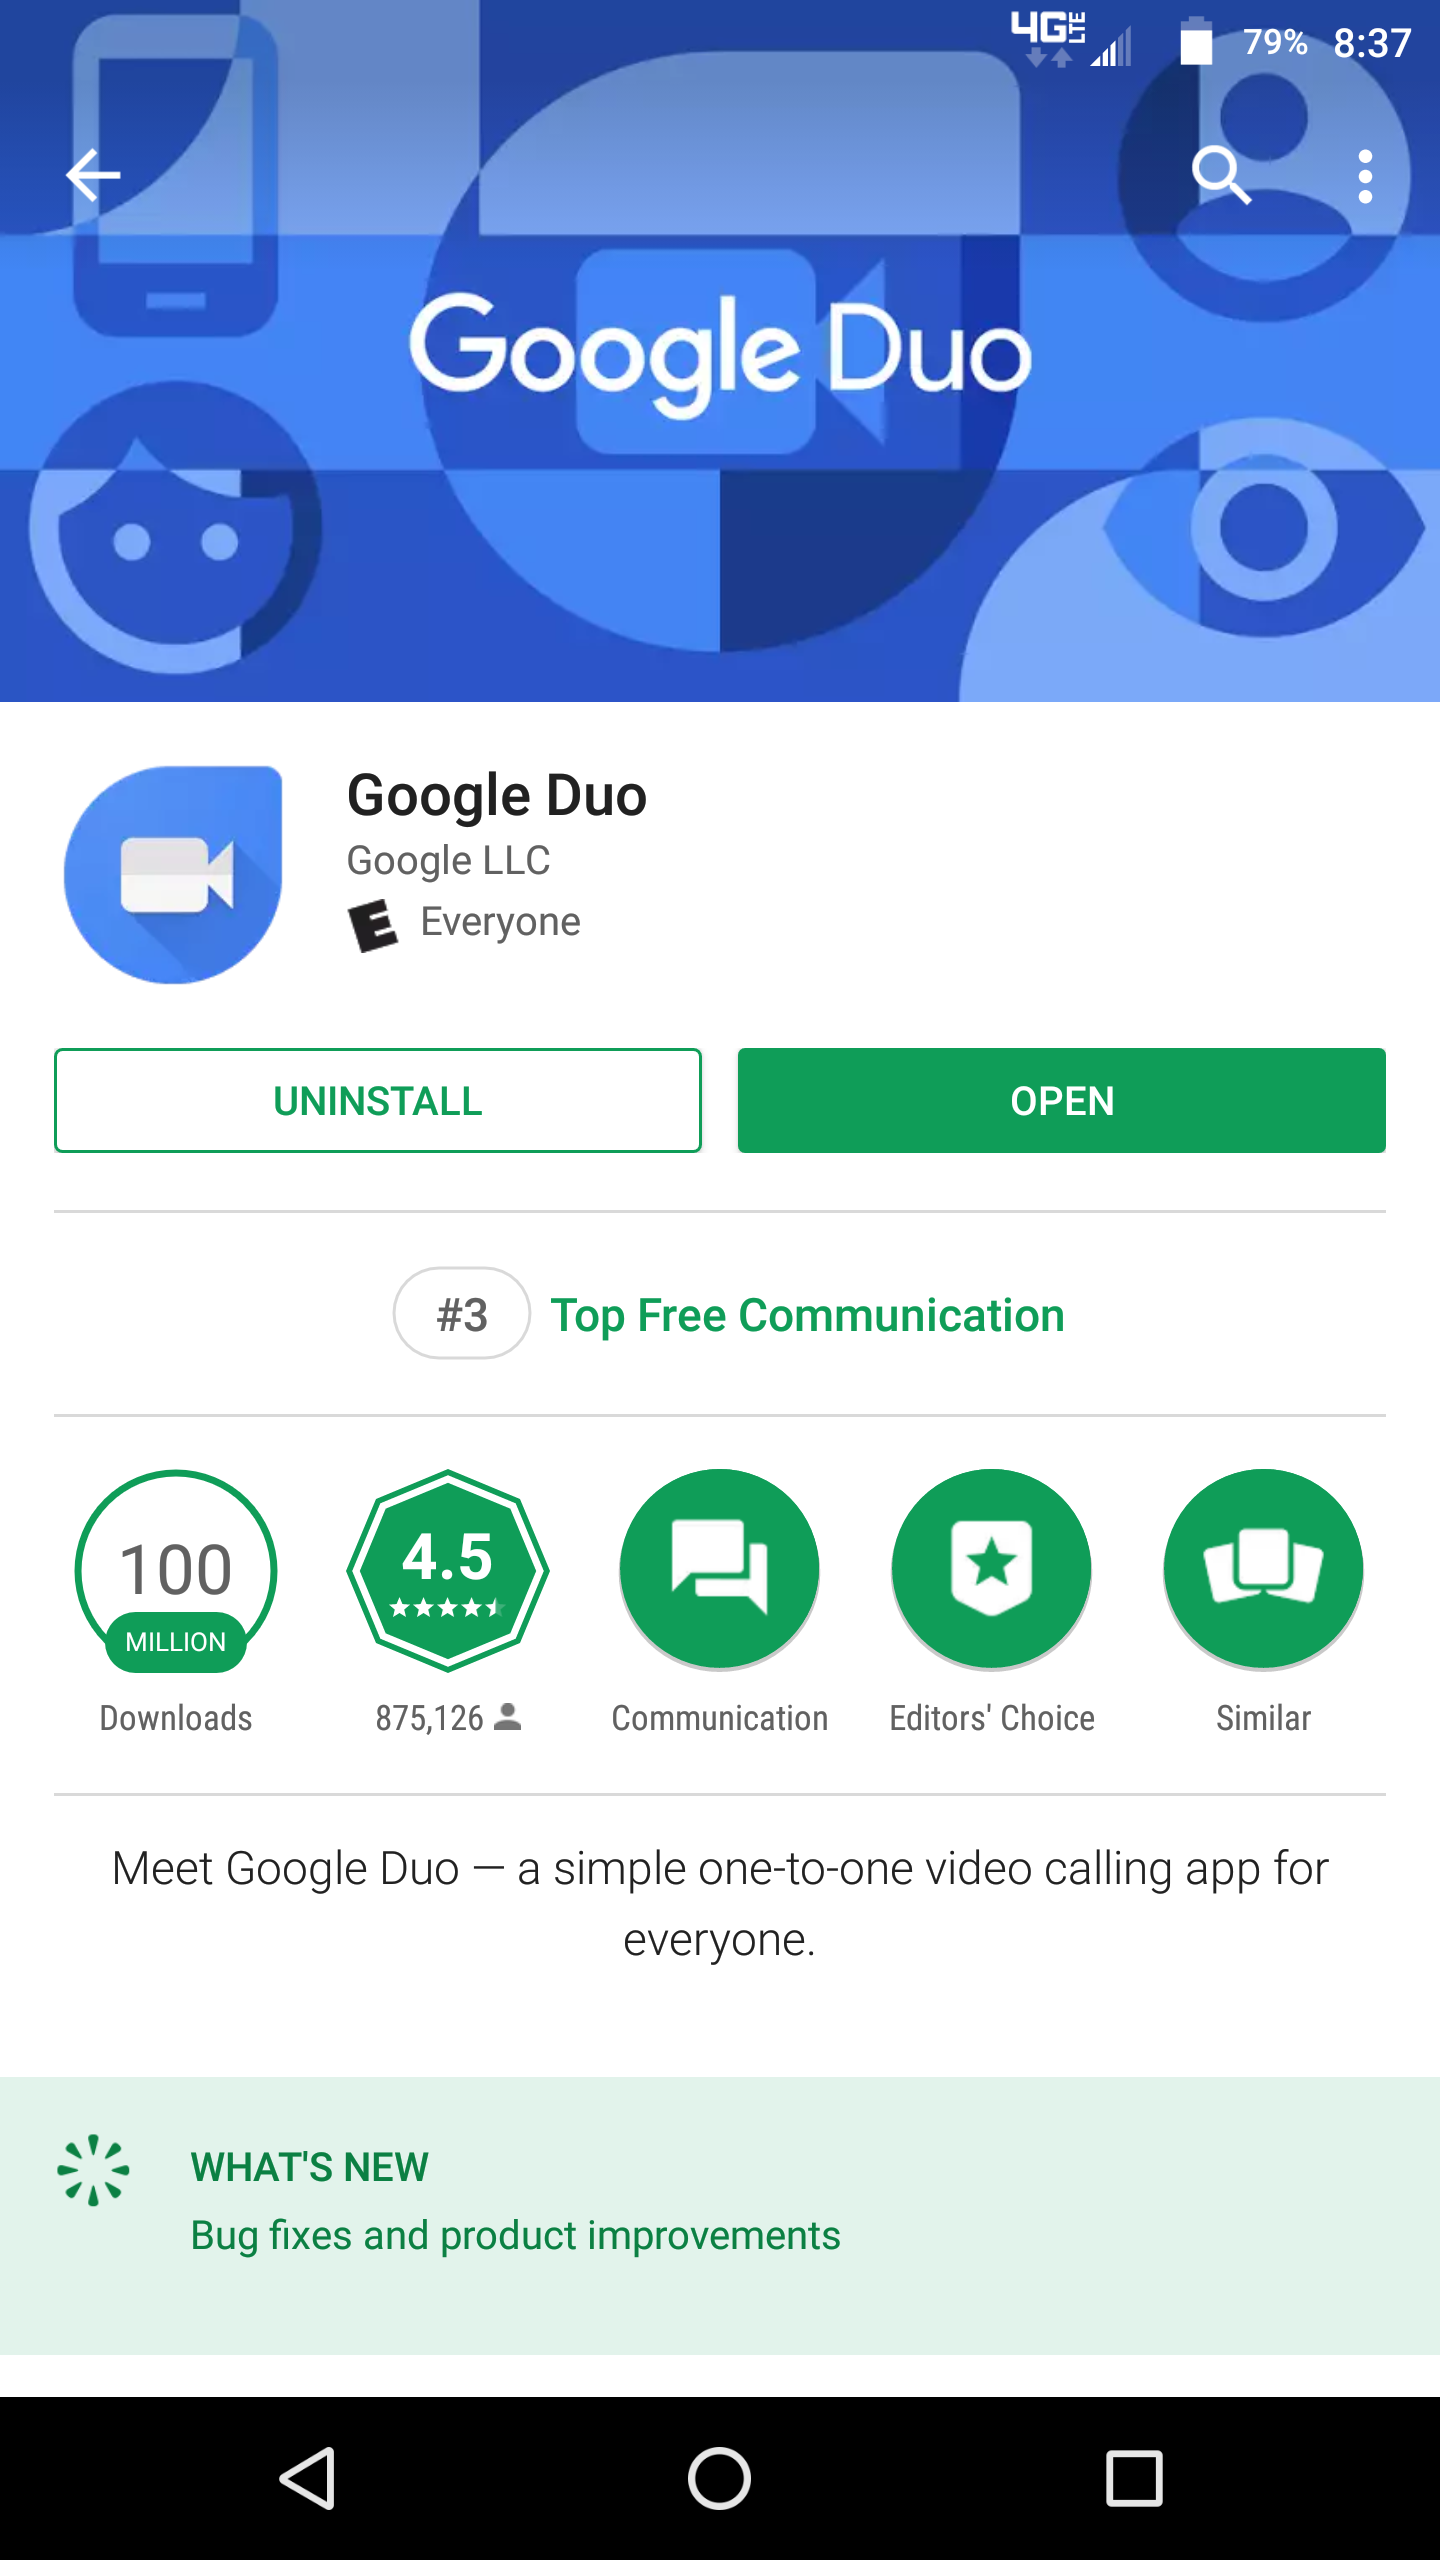 Google Play Tests Displaying Top